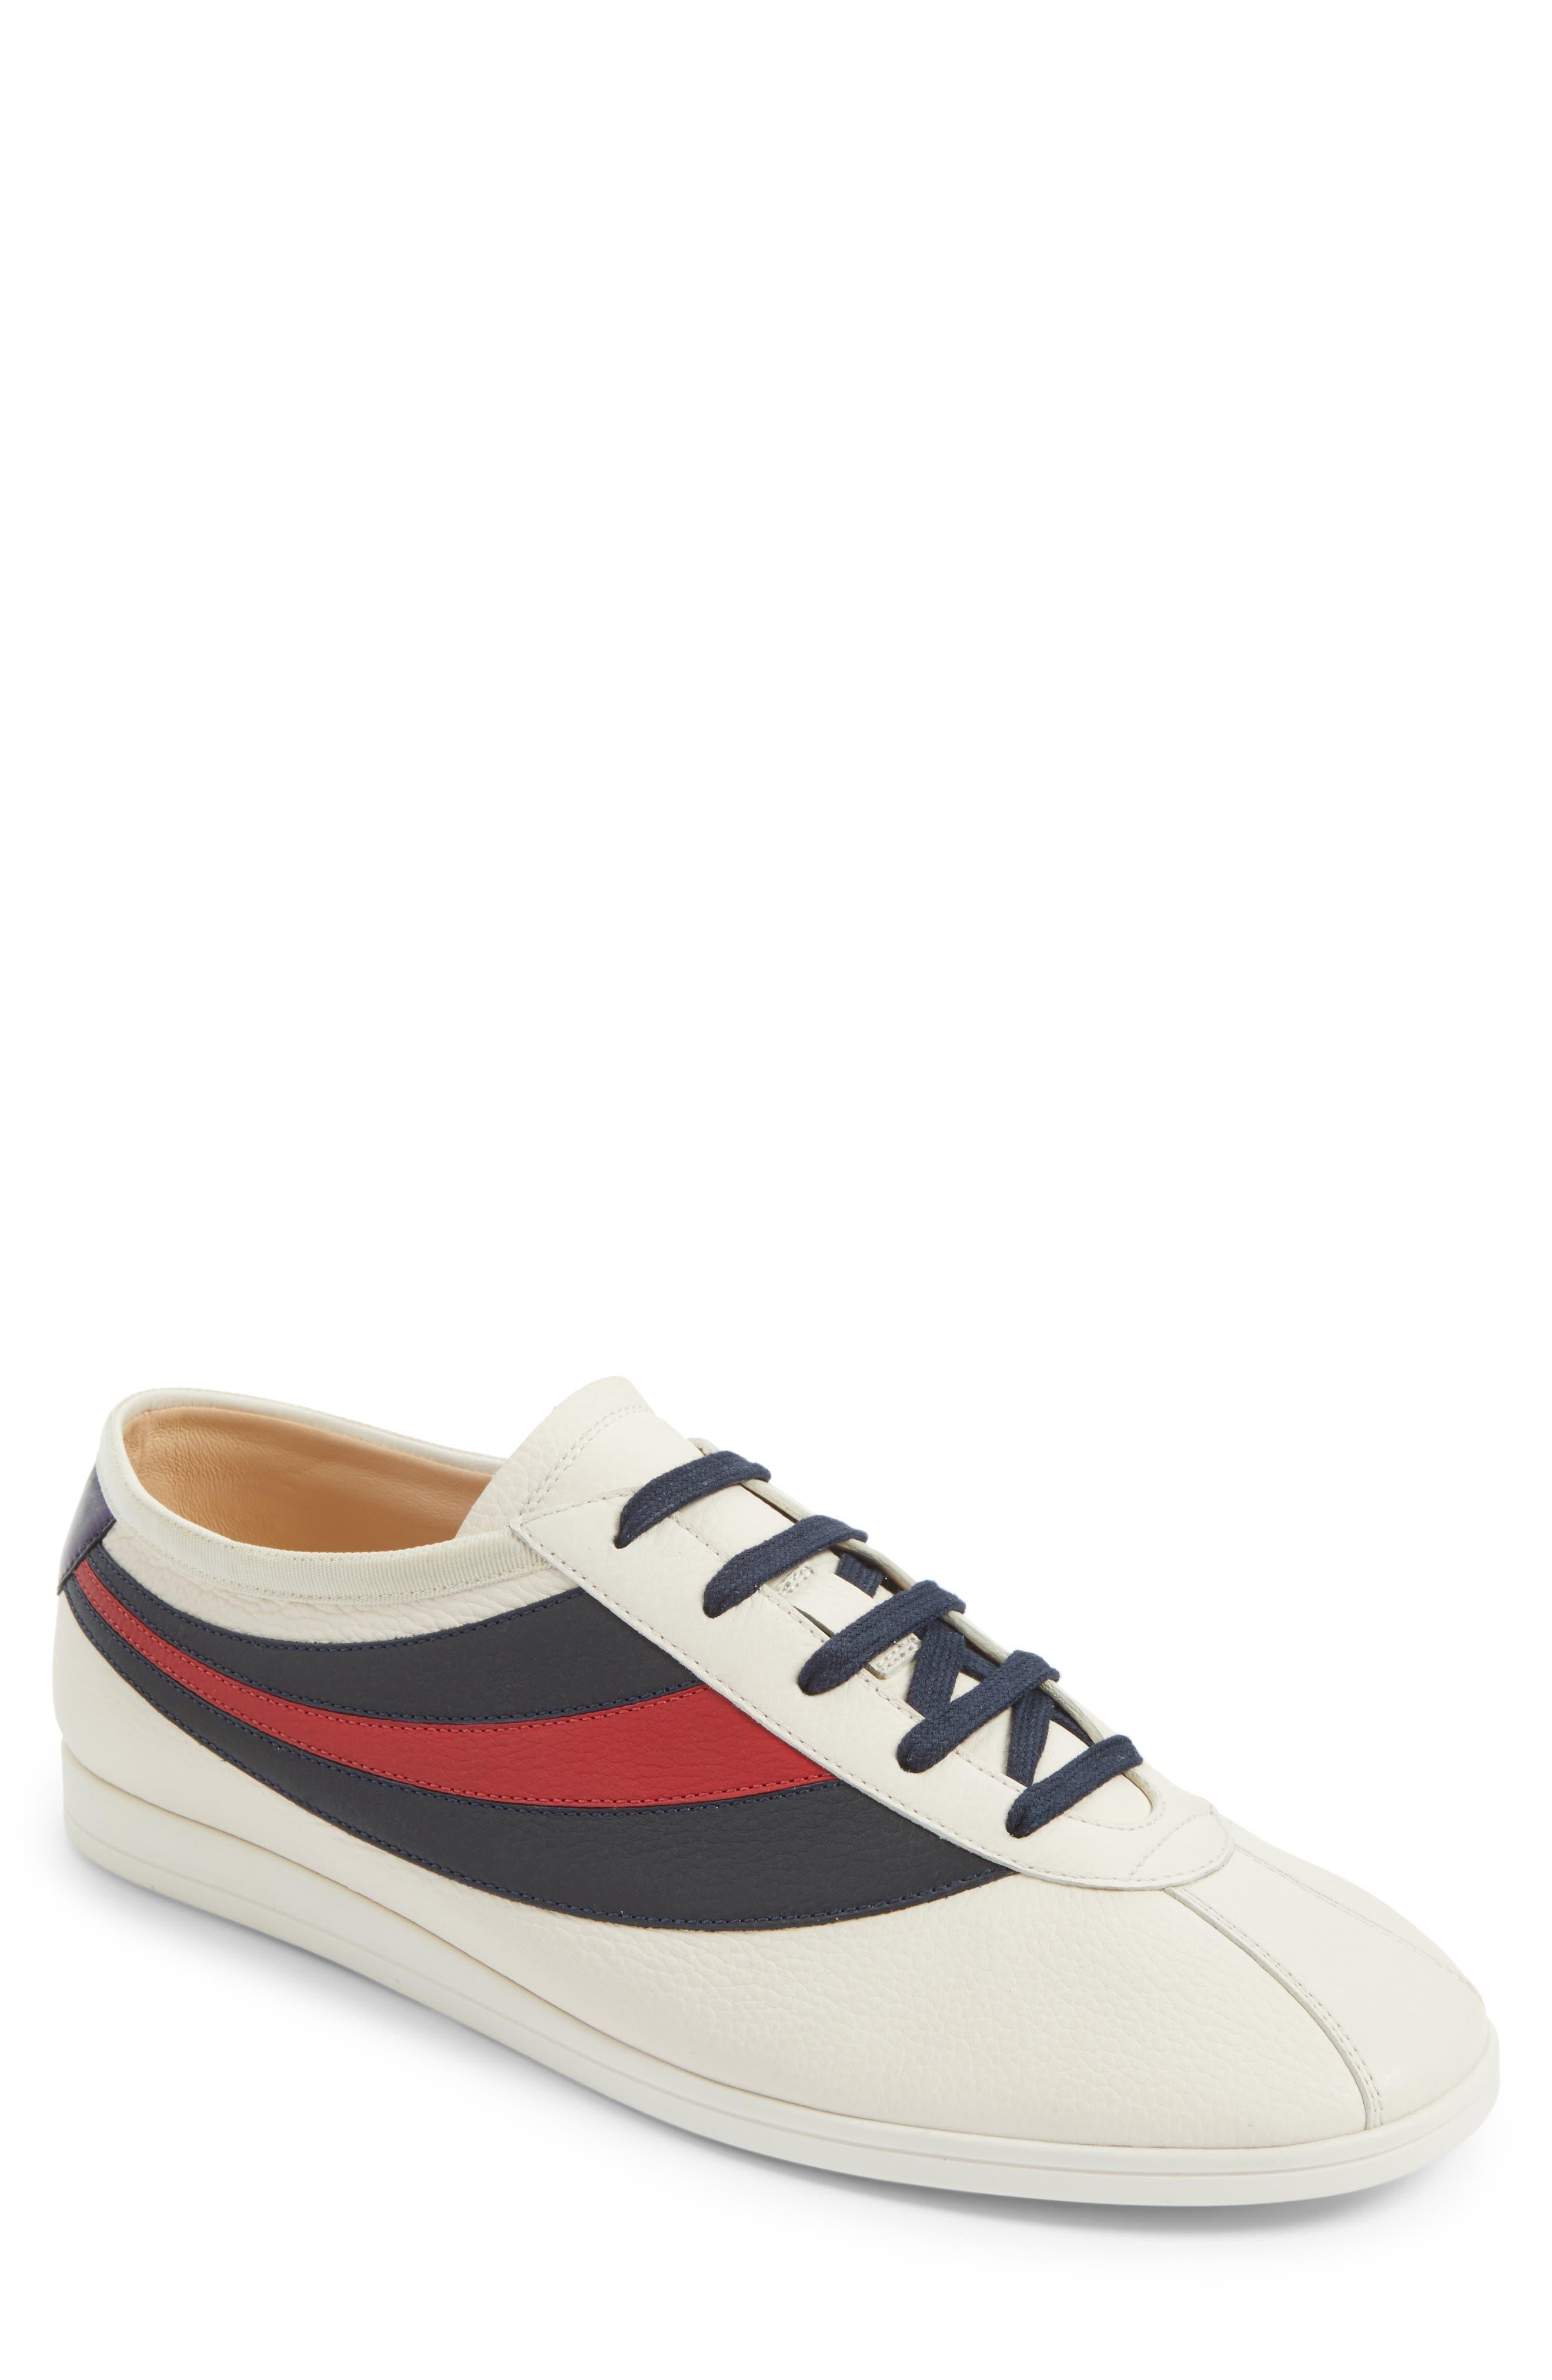 Falacer Sneaker,                             Main thumbnail 1, color,                             White